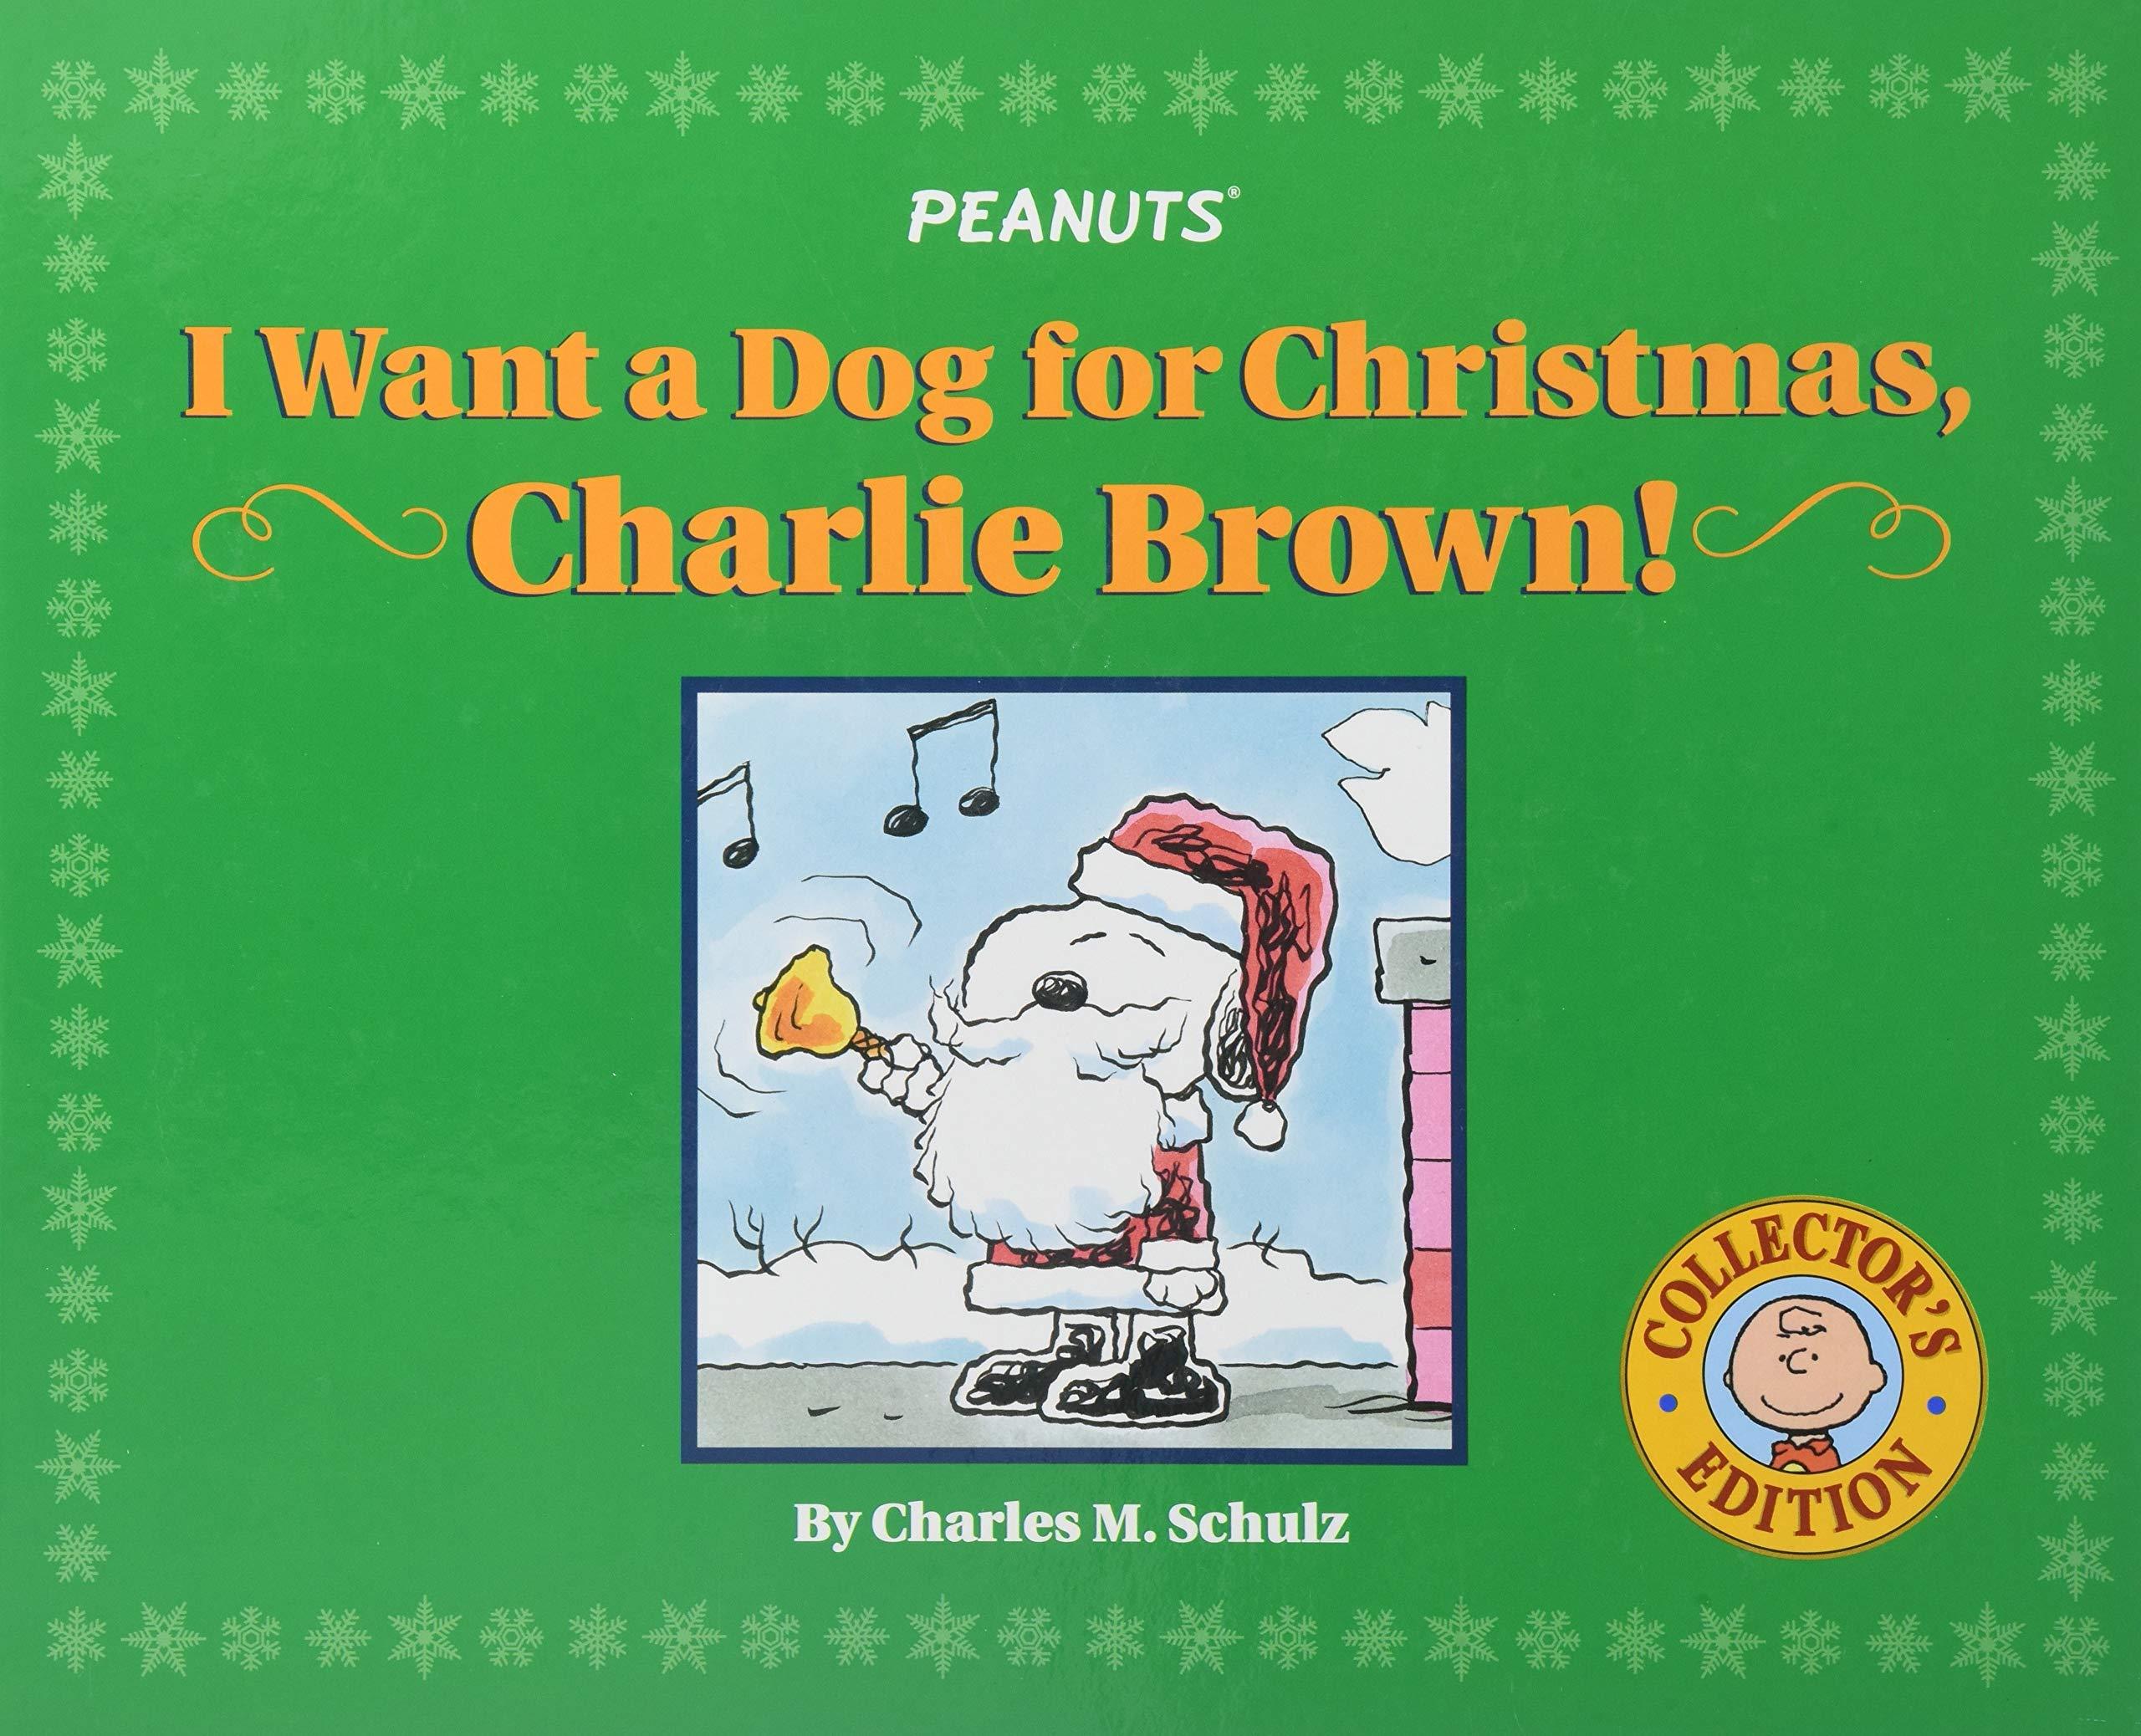 I Want A Dog For Christmas Charlie Brown.I Want A Dog For Christmas Charlie Brown Charles M